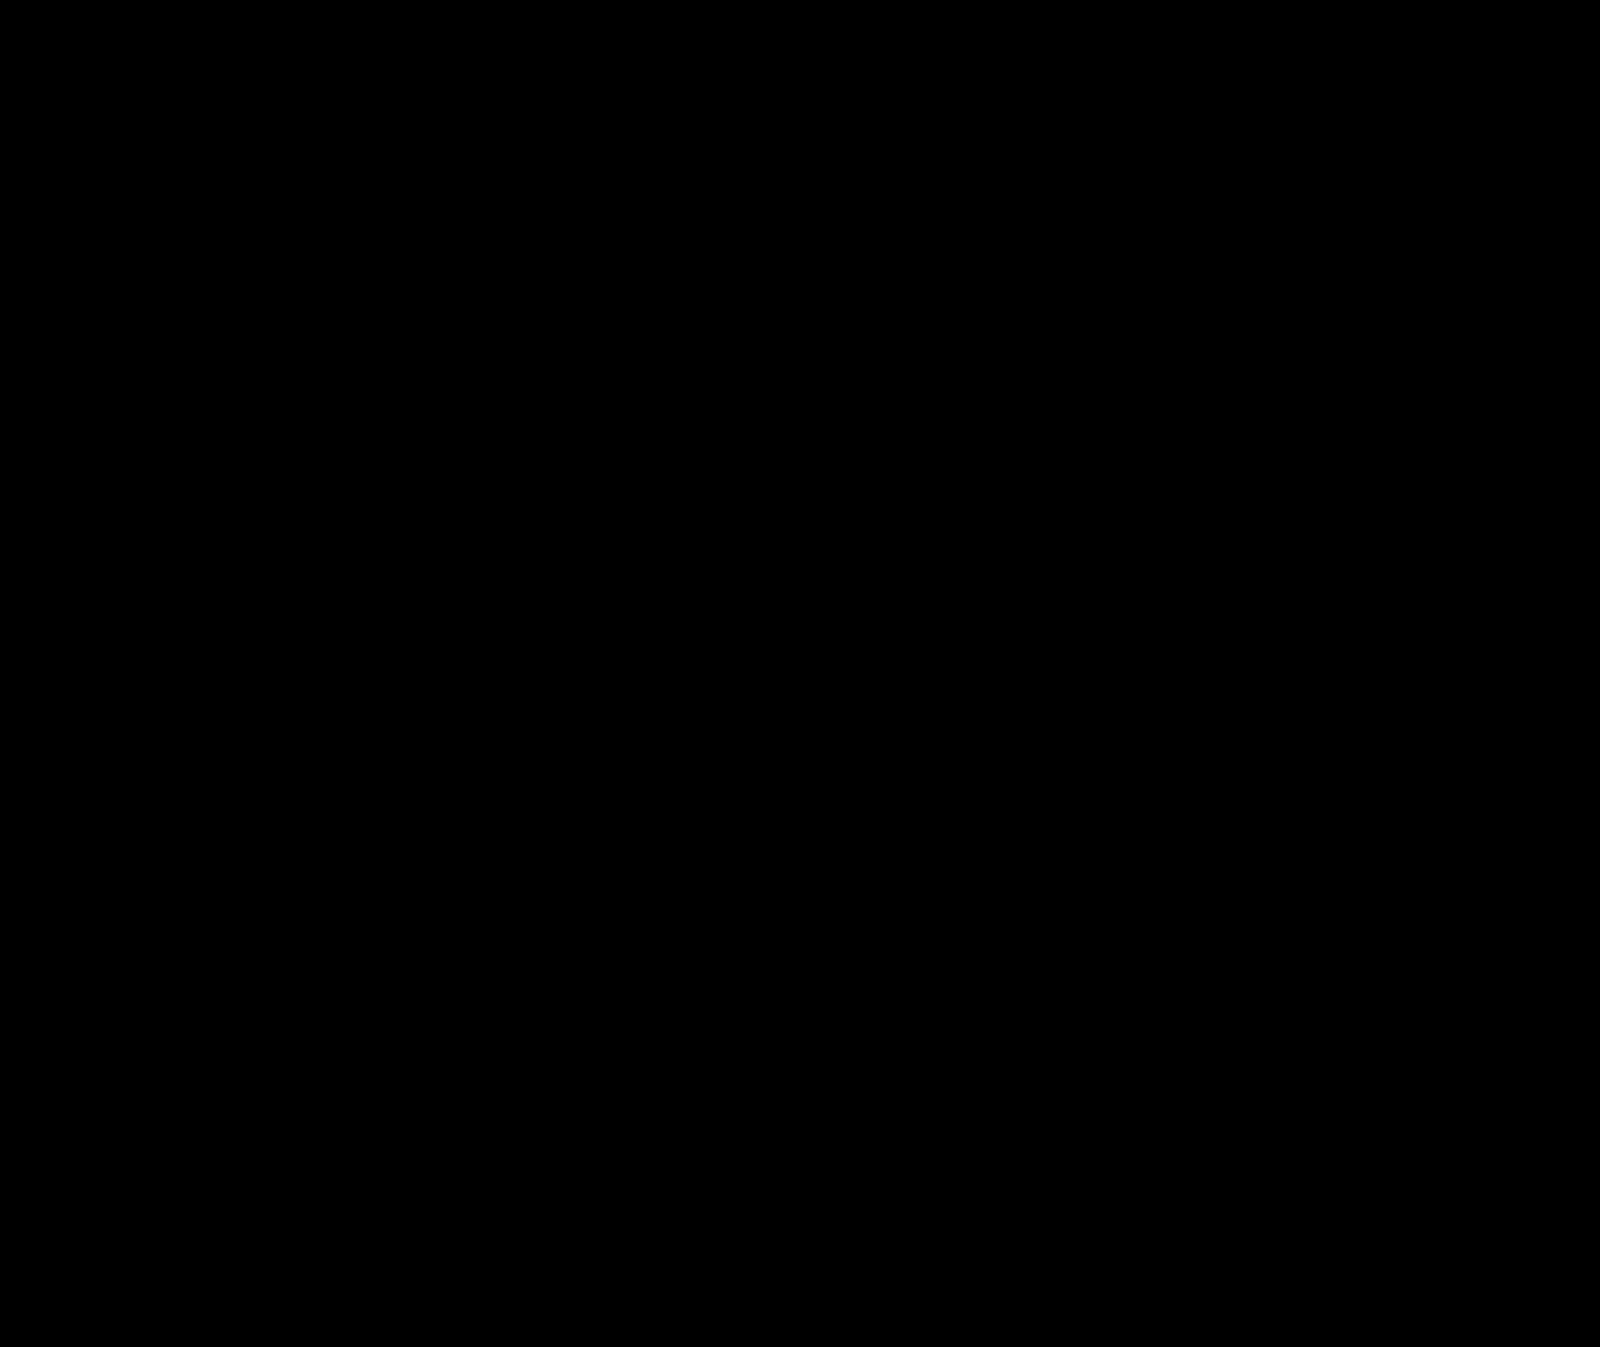 image library stock El cyrillic script alphabet. Black clip letter